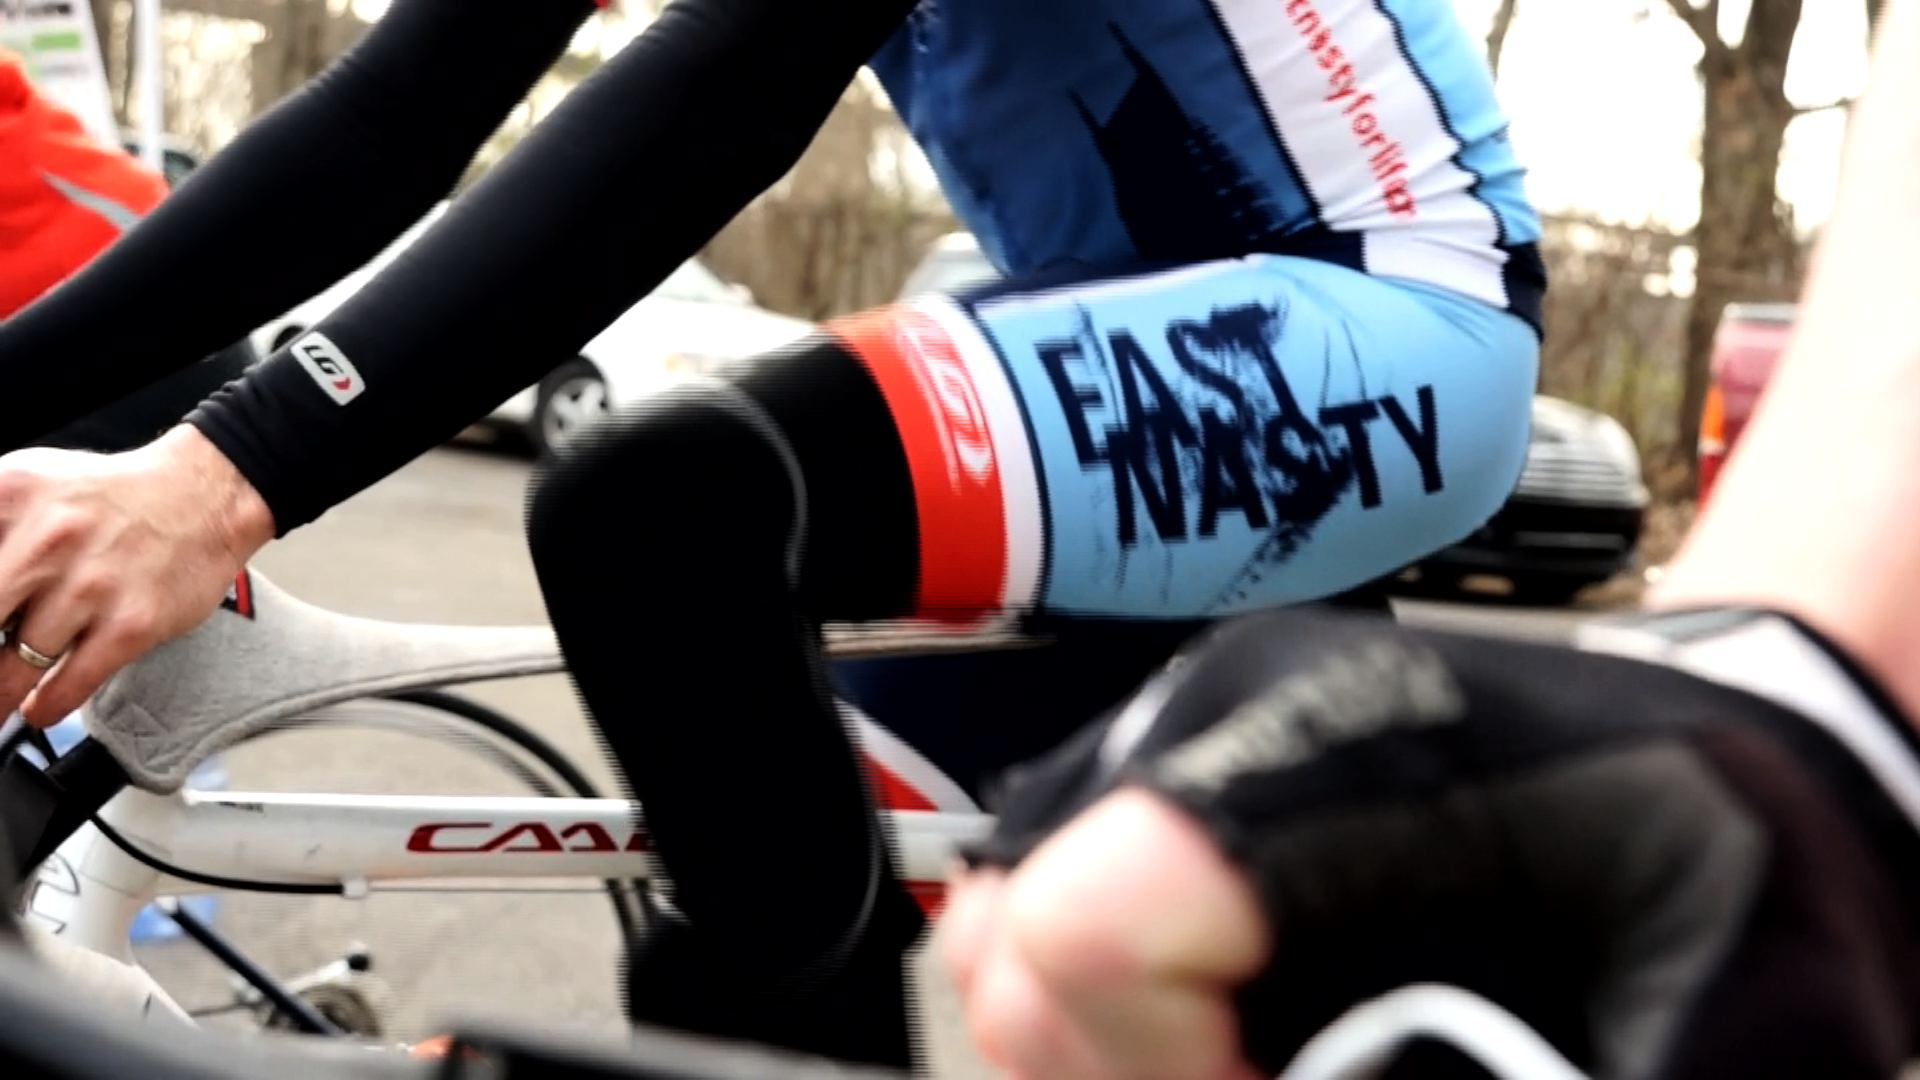 Jim's East Nasty gear